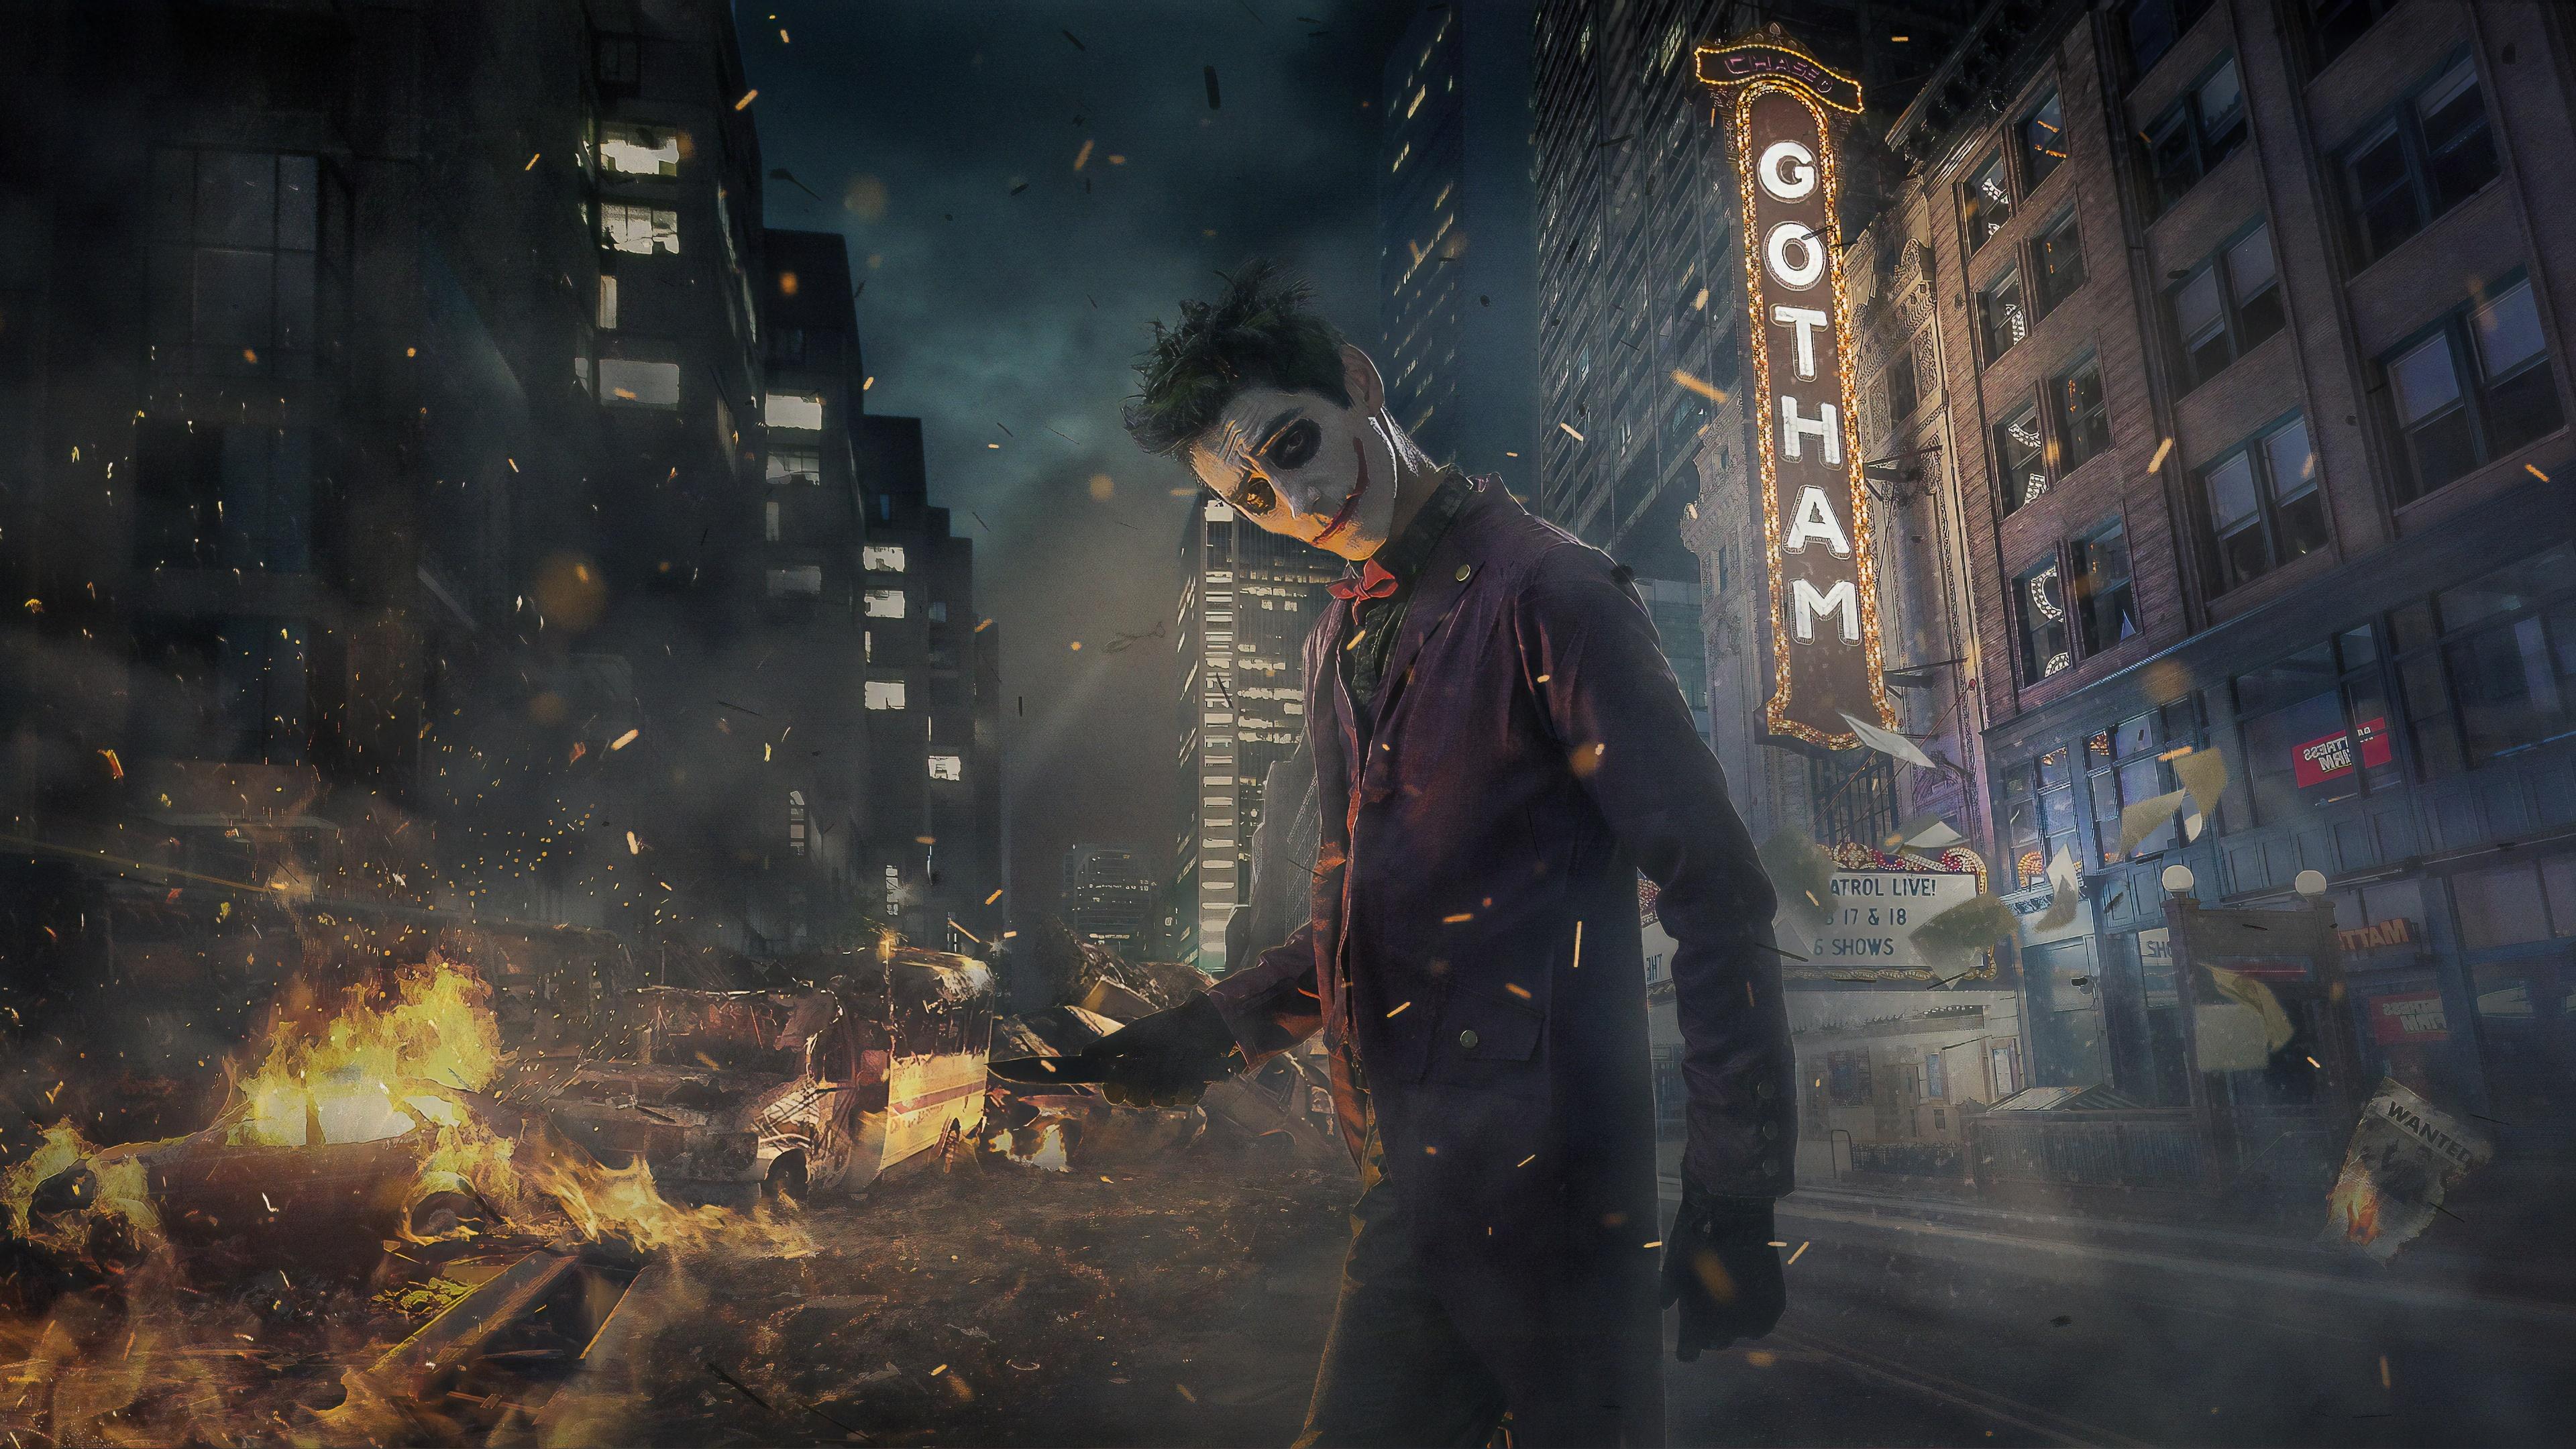 joker cosplay gotham burning 1559764222 - Joker Cosplay Gotham Burning - superheroes wallpapers, joker wallpapers, hd-wallpapers, cosplay wallpapers, behance wallpapers, 4k-wallpapers